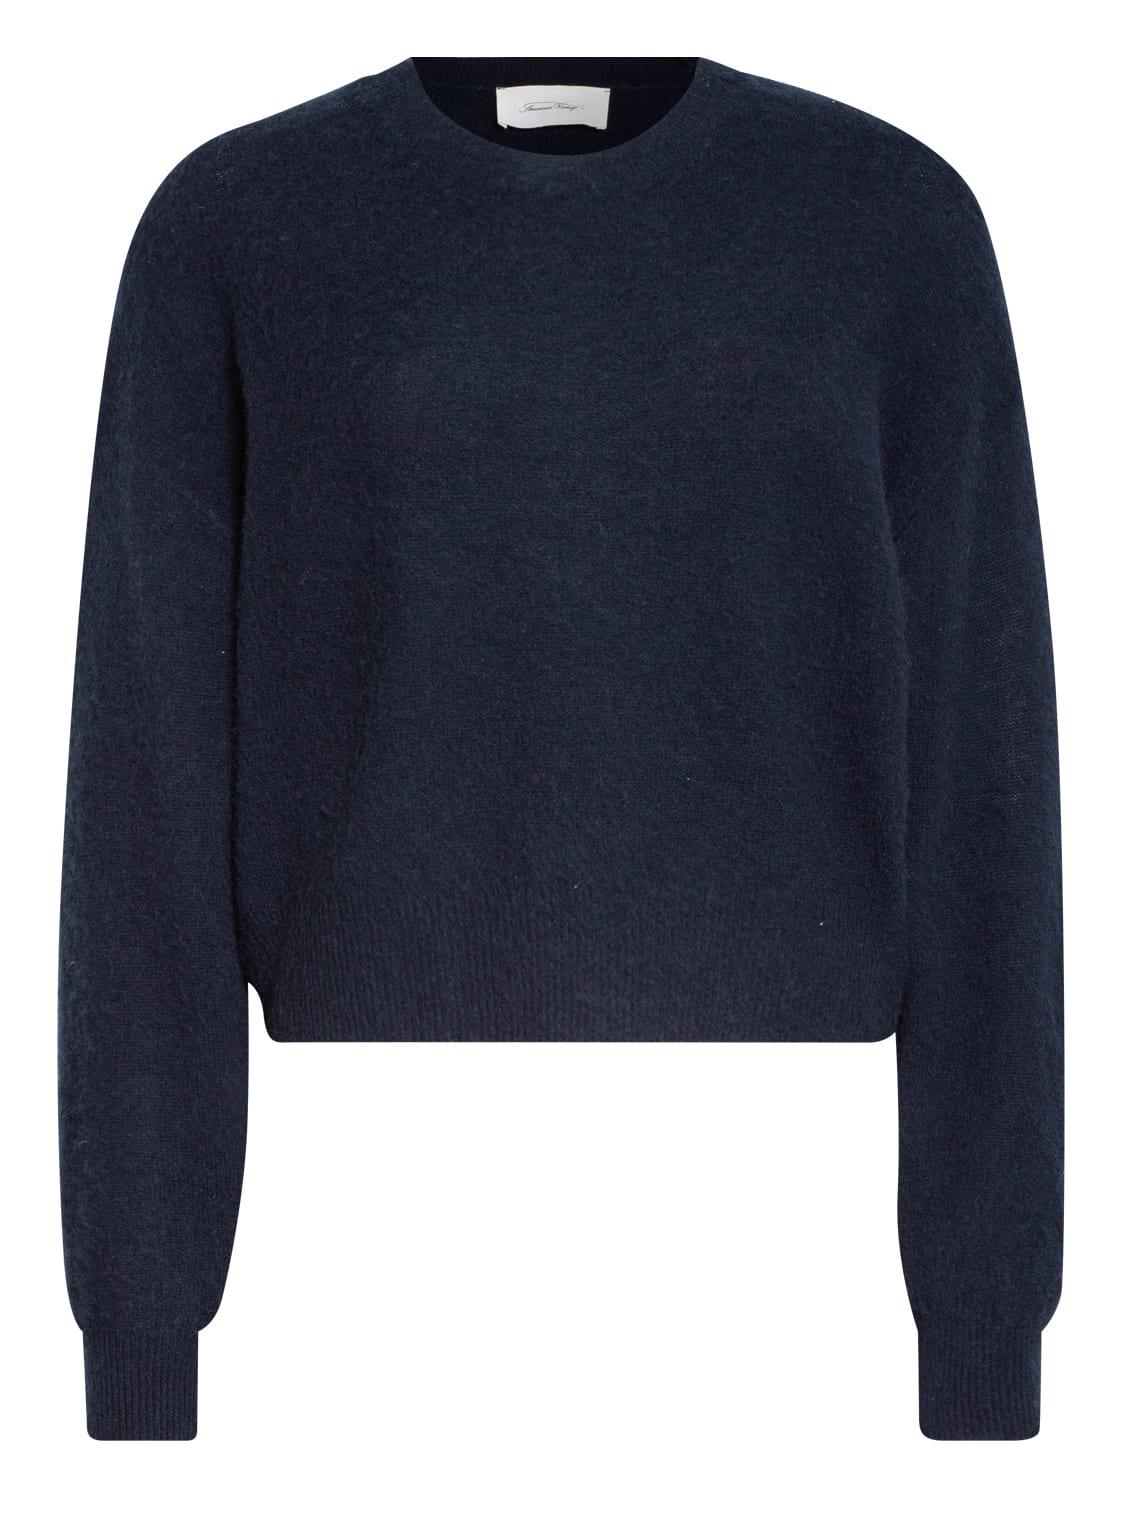 Image of American Vintage Cashmere-Pullover schwarz